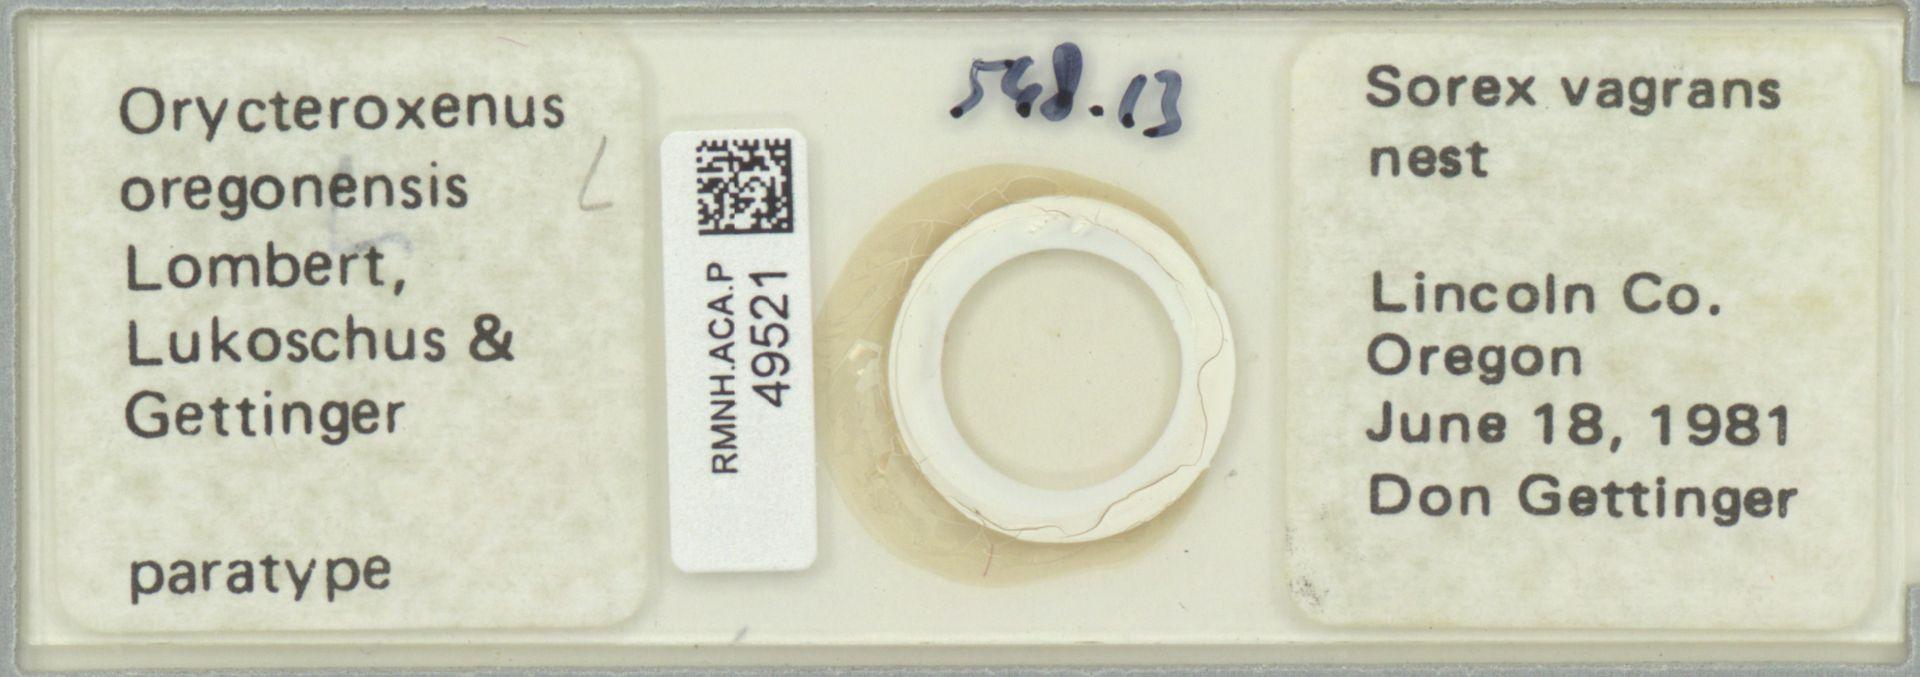 RMNH.ACA.P.49521 | Orycteroxenus oregonensis Lombert,Lukoschus & Gettinger